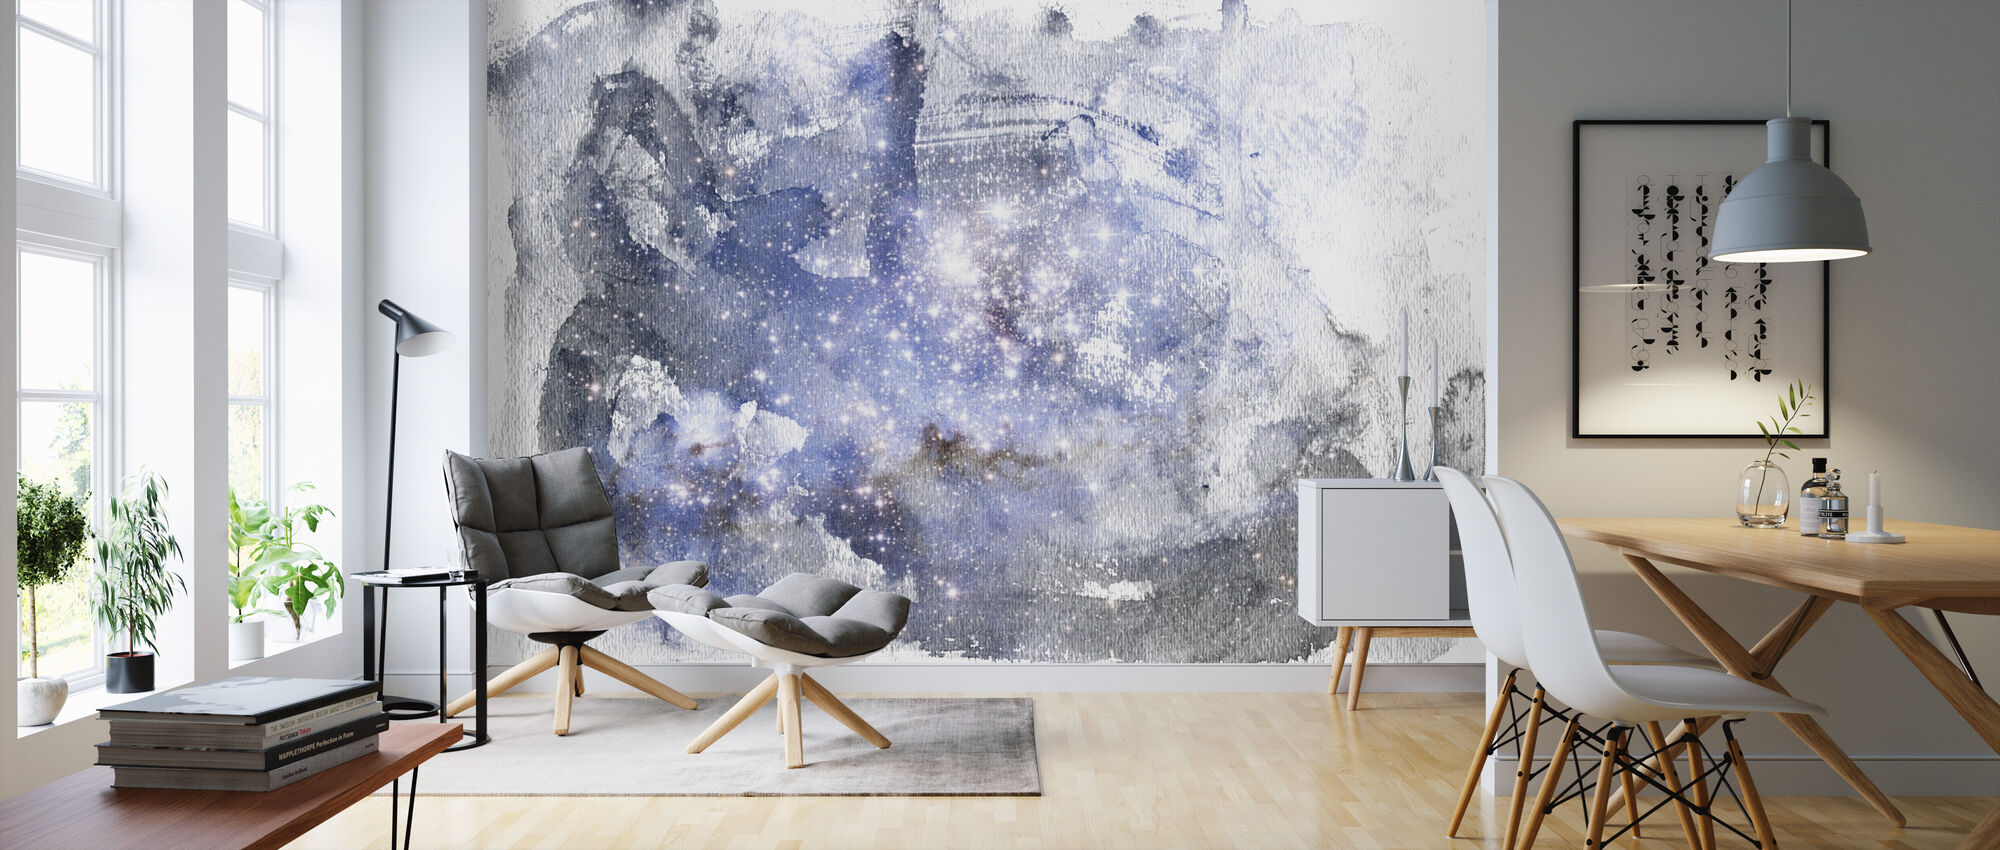 Watercolor Galaxy - Wallpaper - Living Room